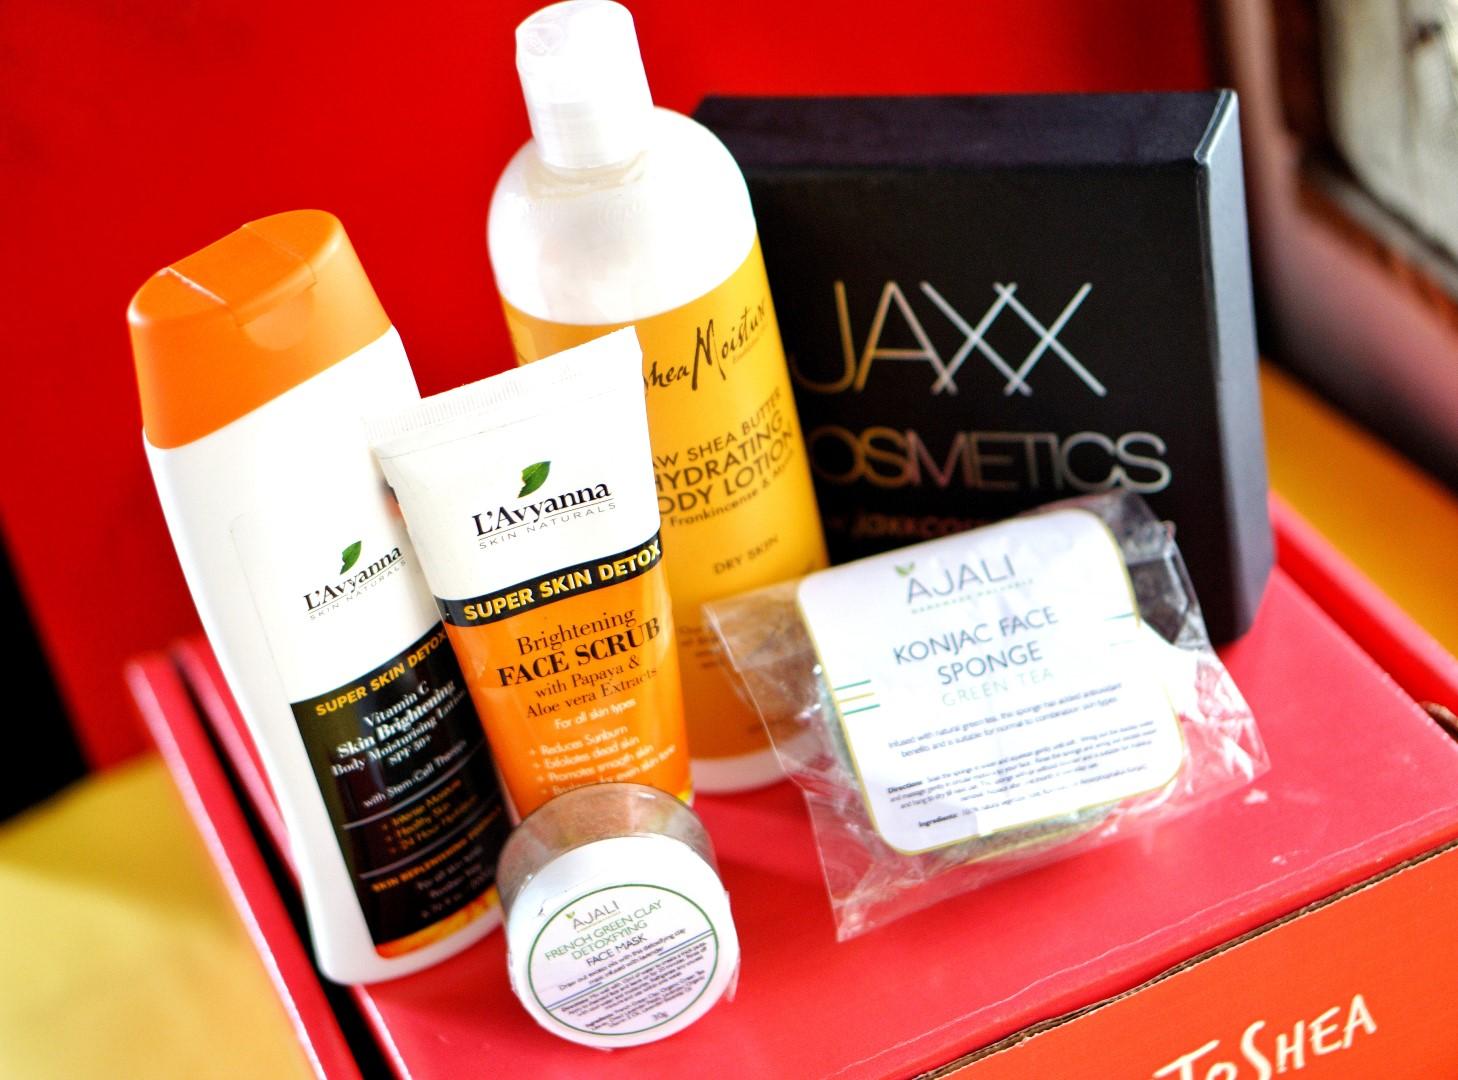 L'avyanna naturals super skin detox, jaxx cosmetics lipsticsk and ajali naturals products